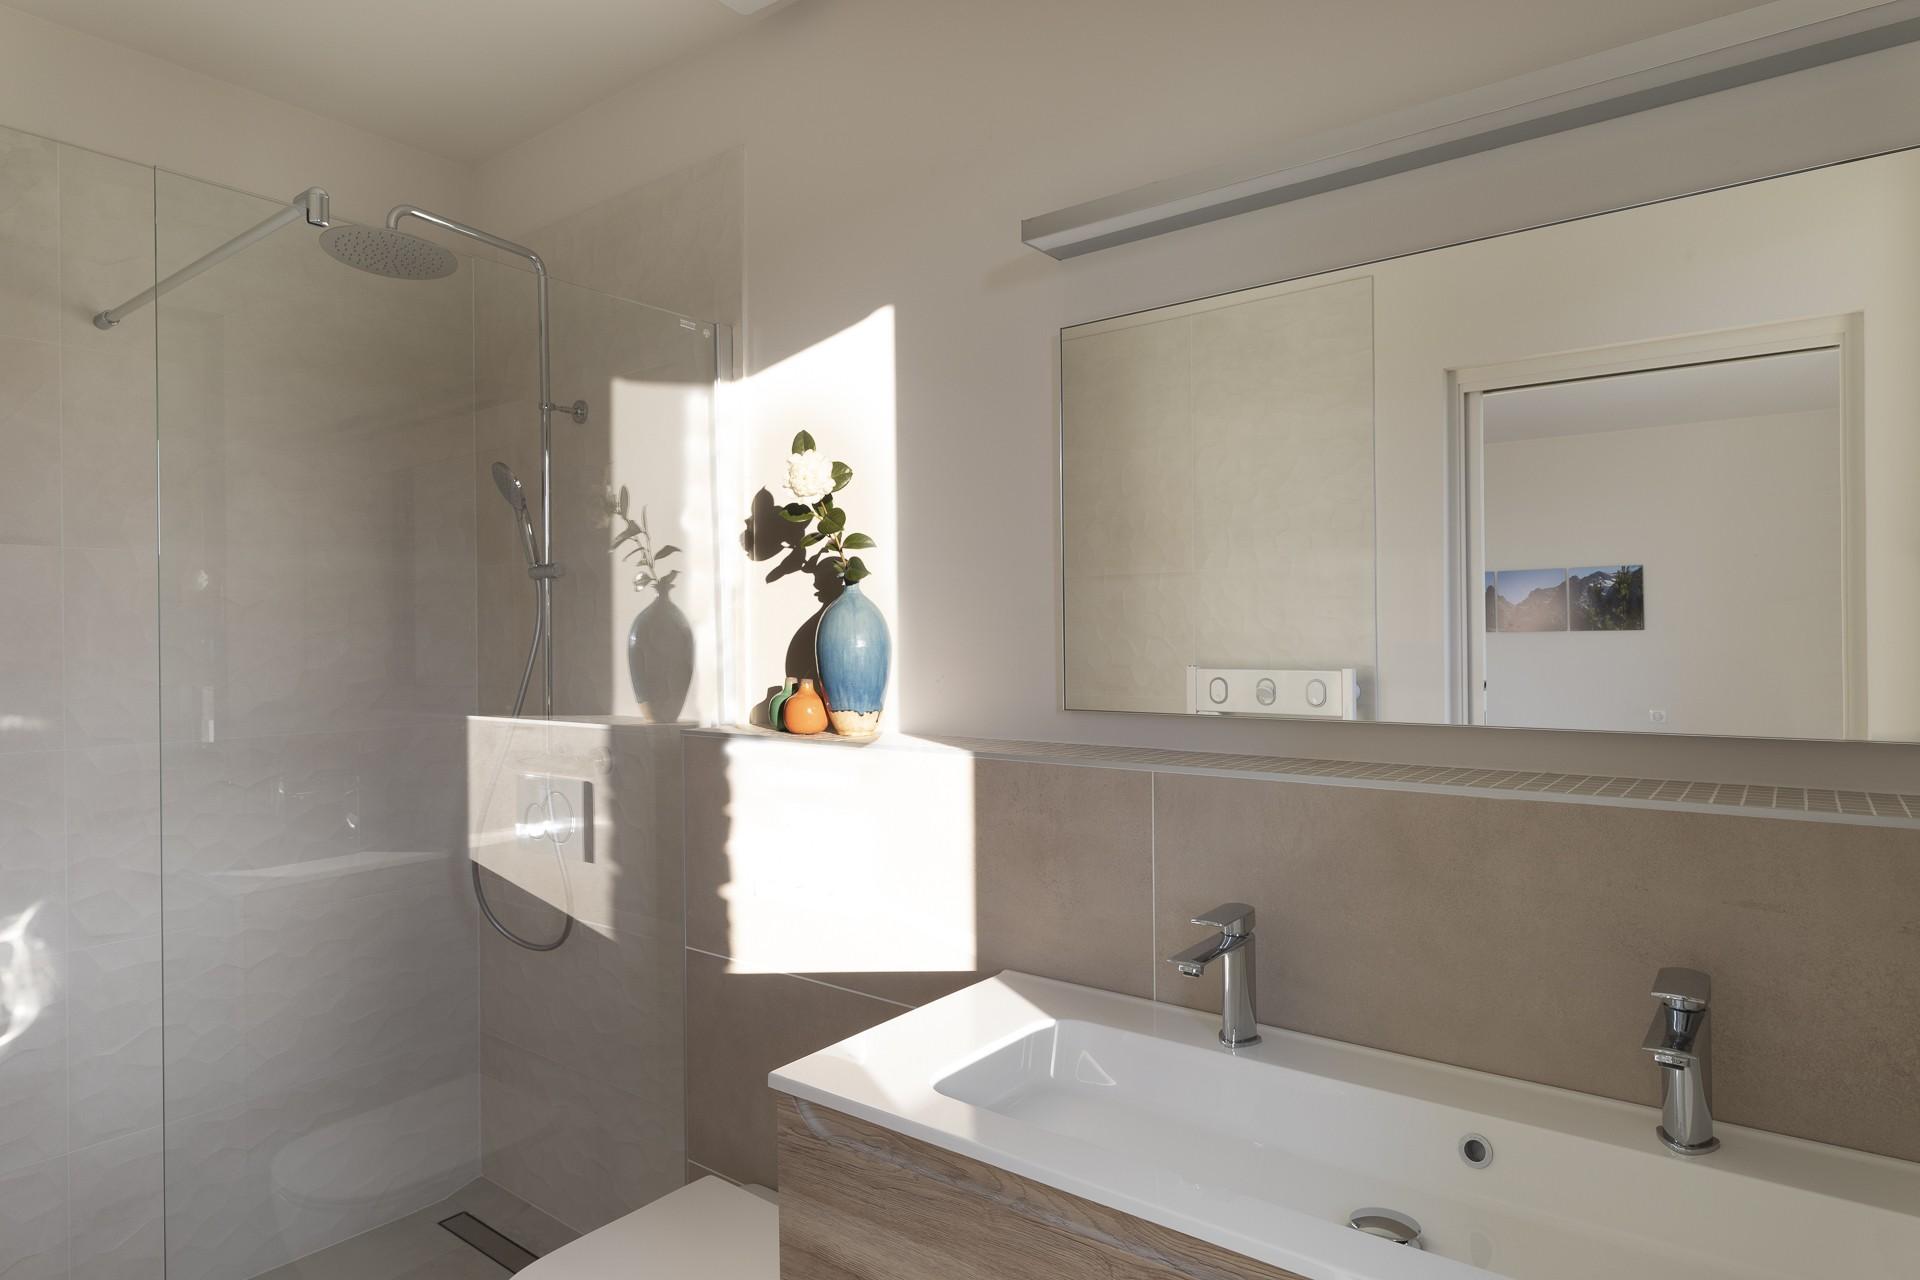 Porto Vecchio Luxury Rental Villa Perle Shower Room 3